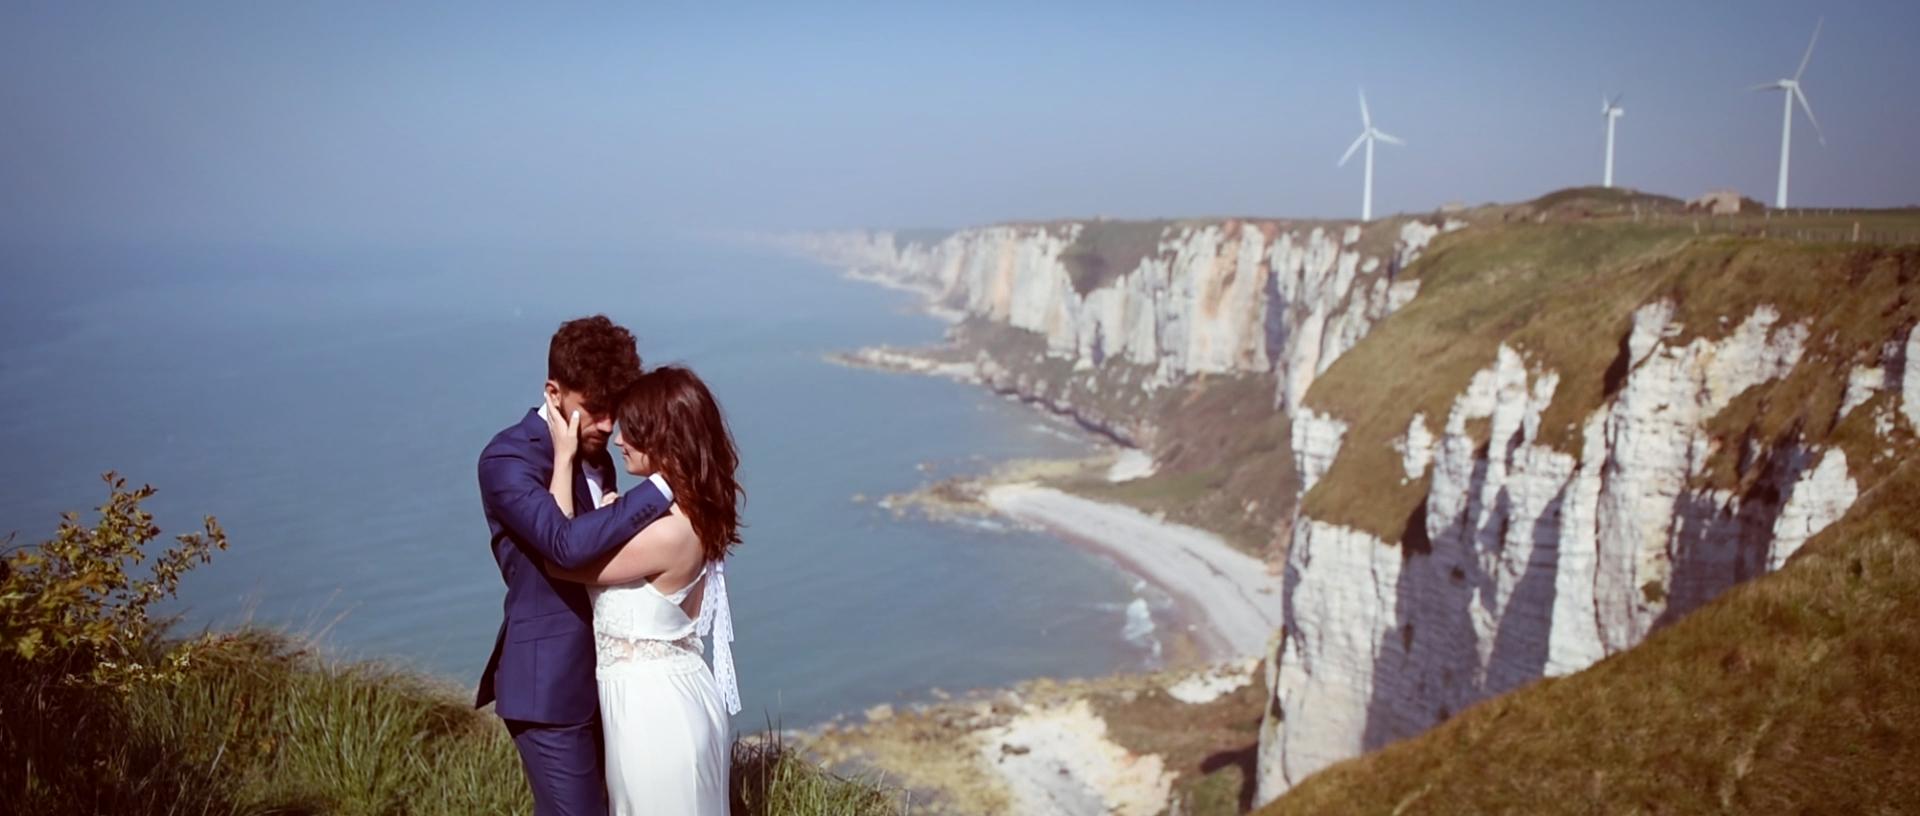 vidéaste mariage Inspiration Normandie Fecamp